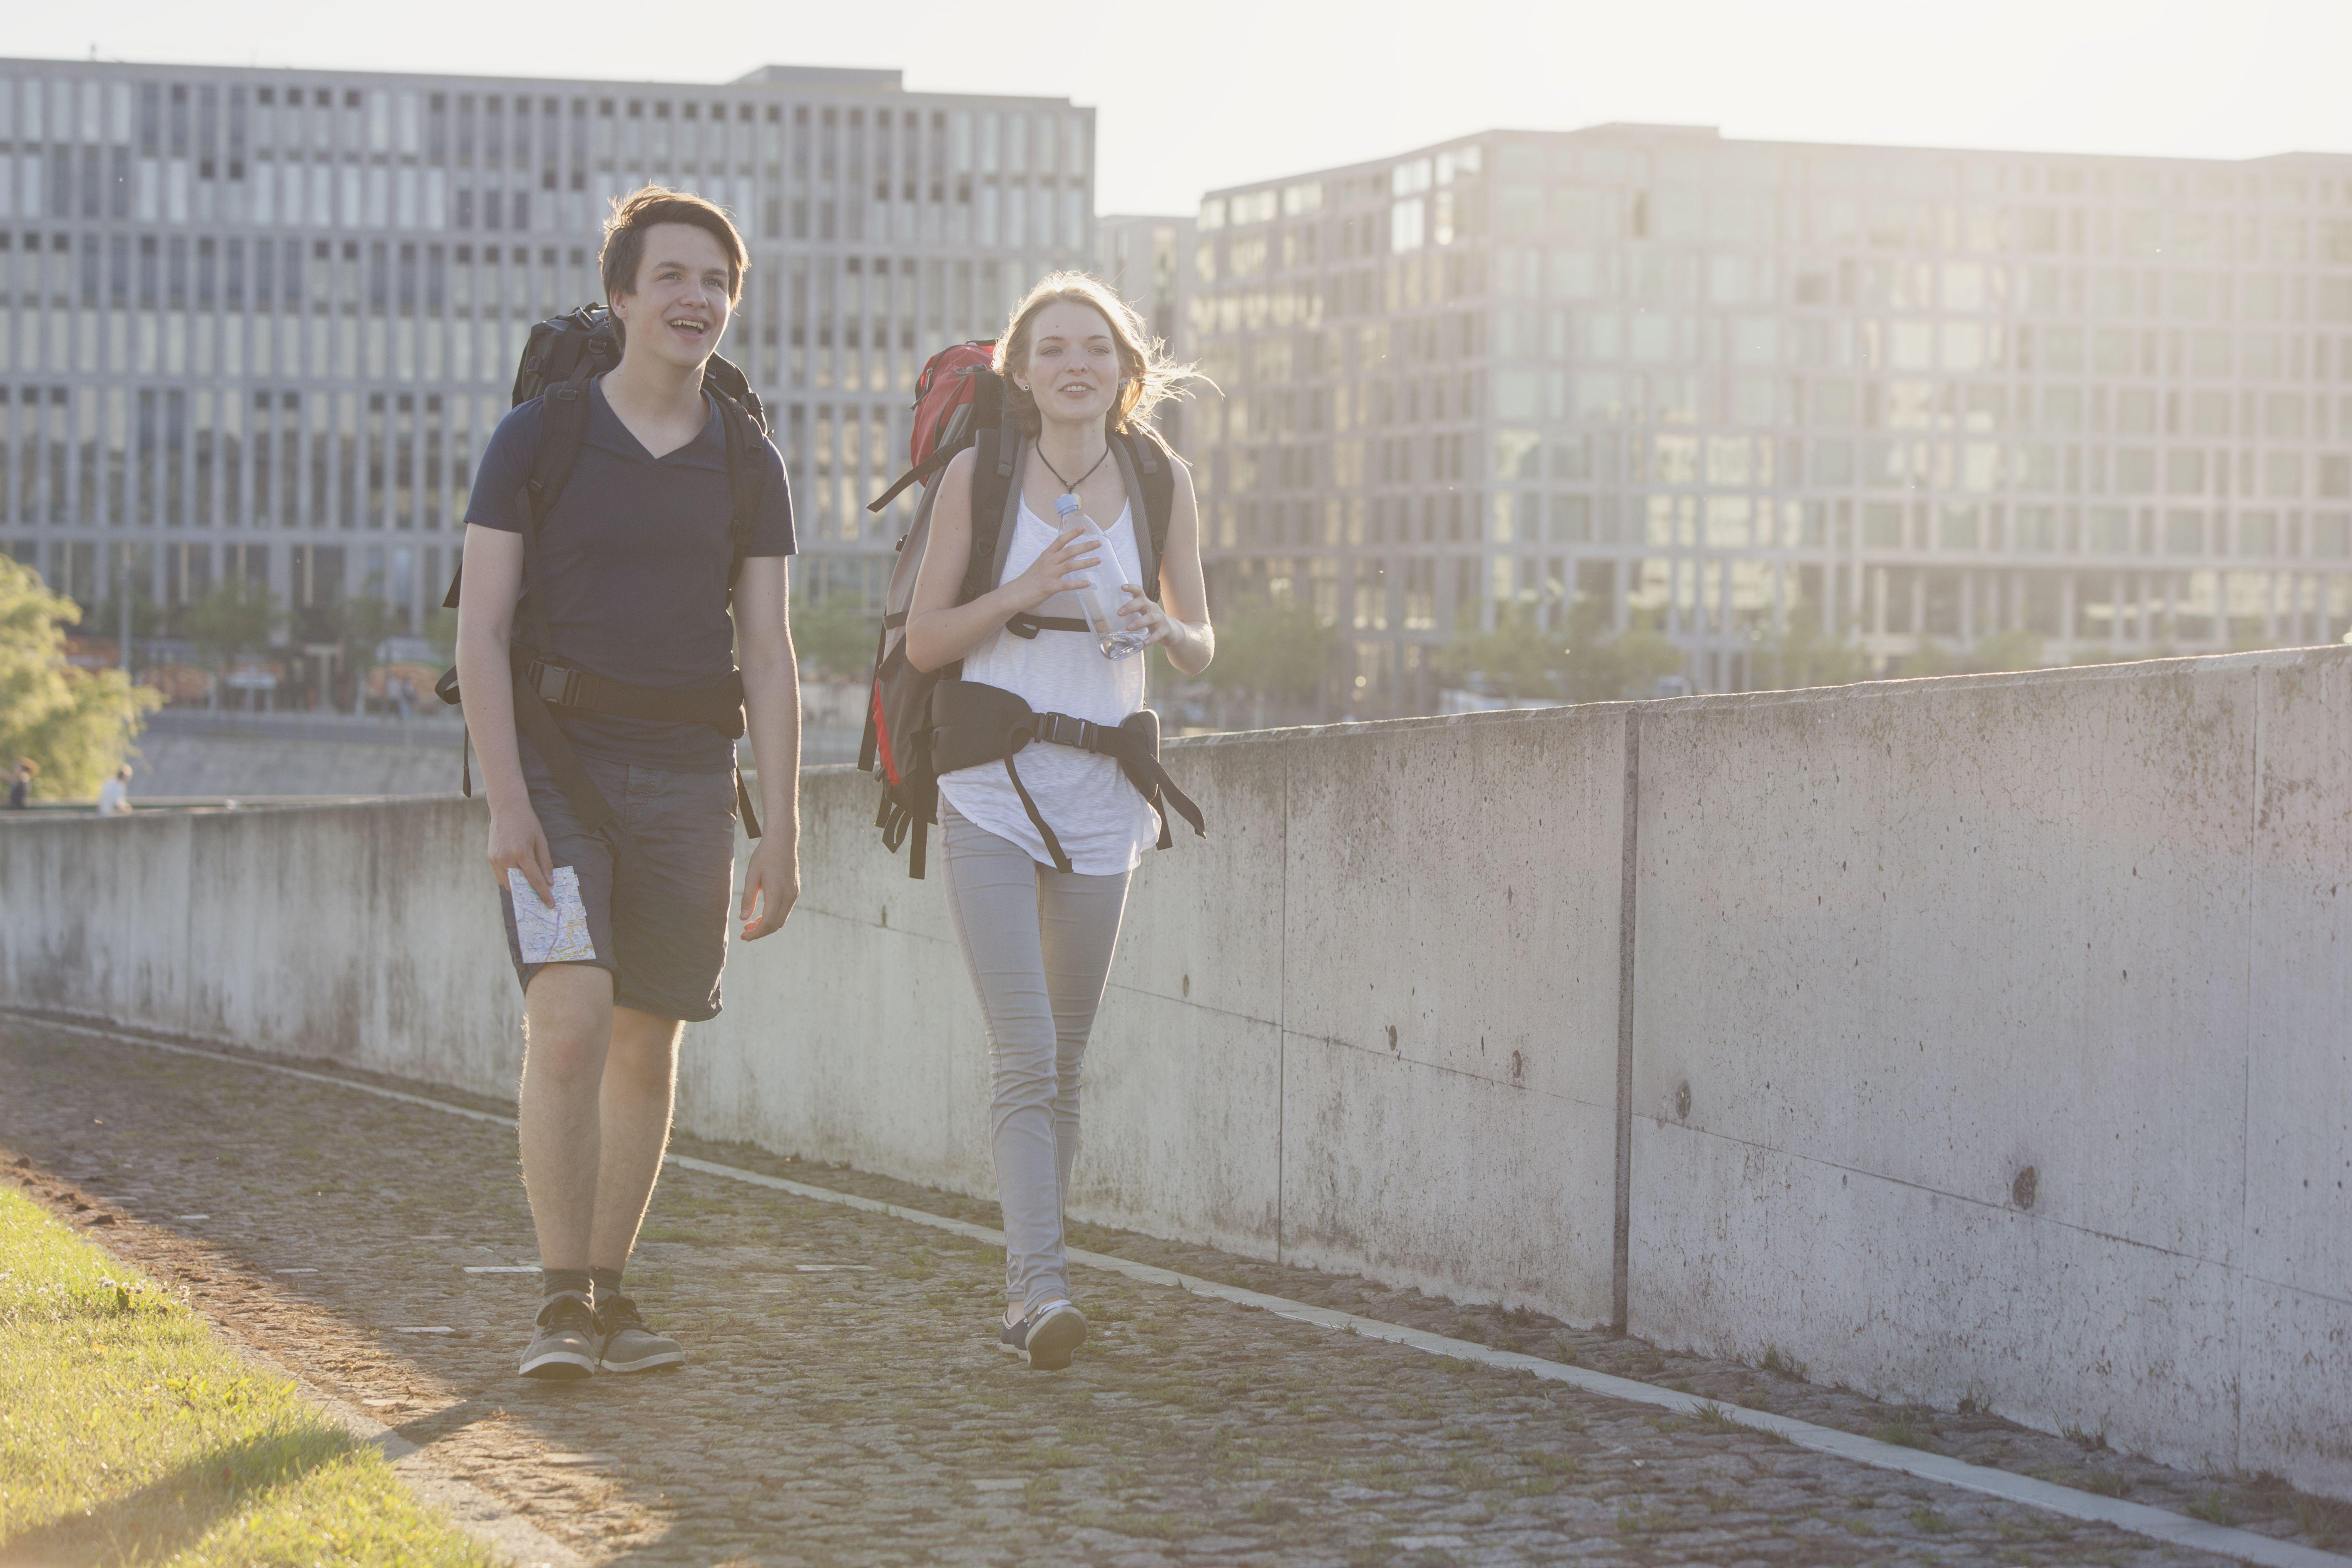 Young couple walking outside wearing backpacks